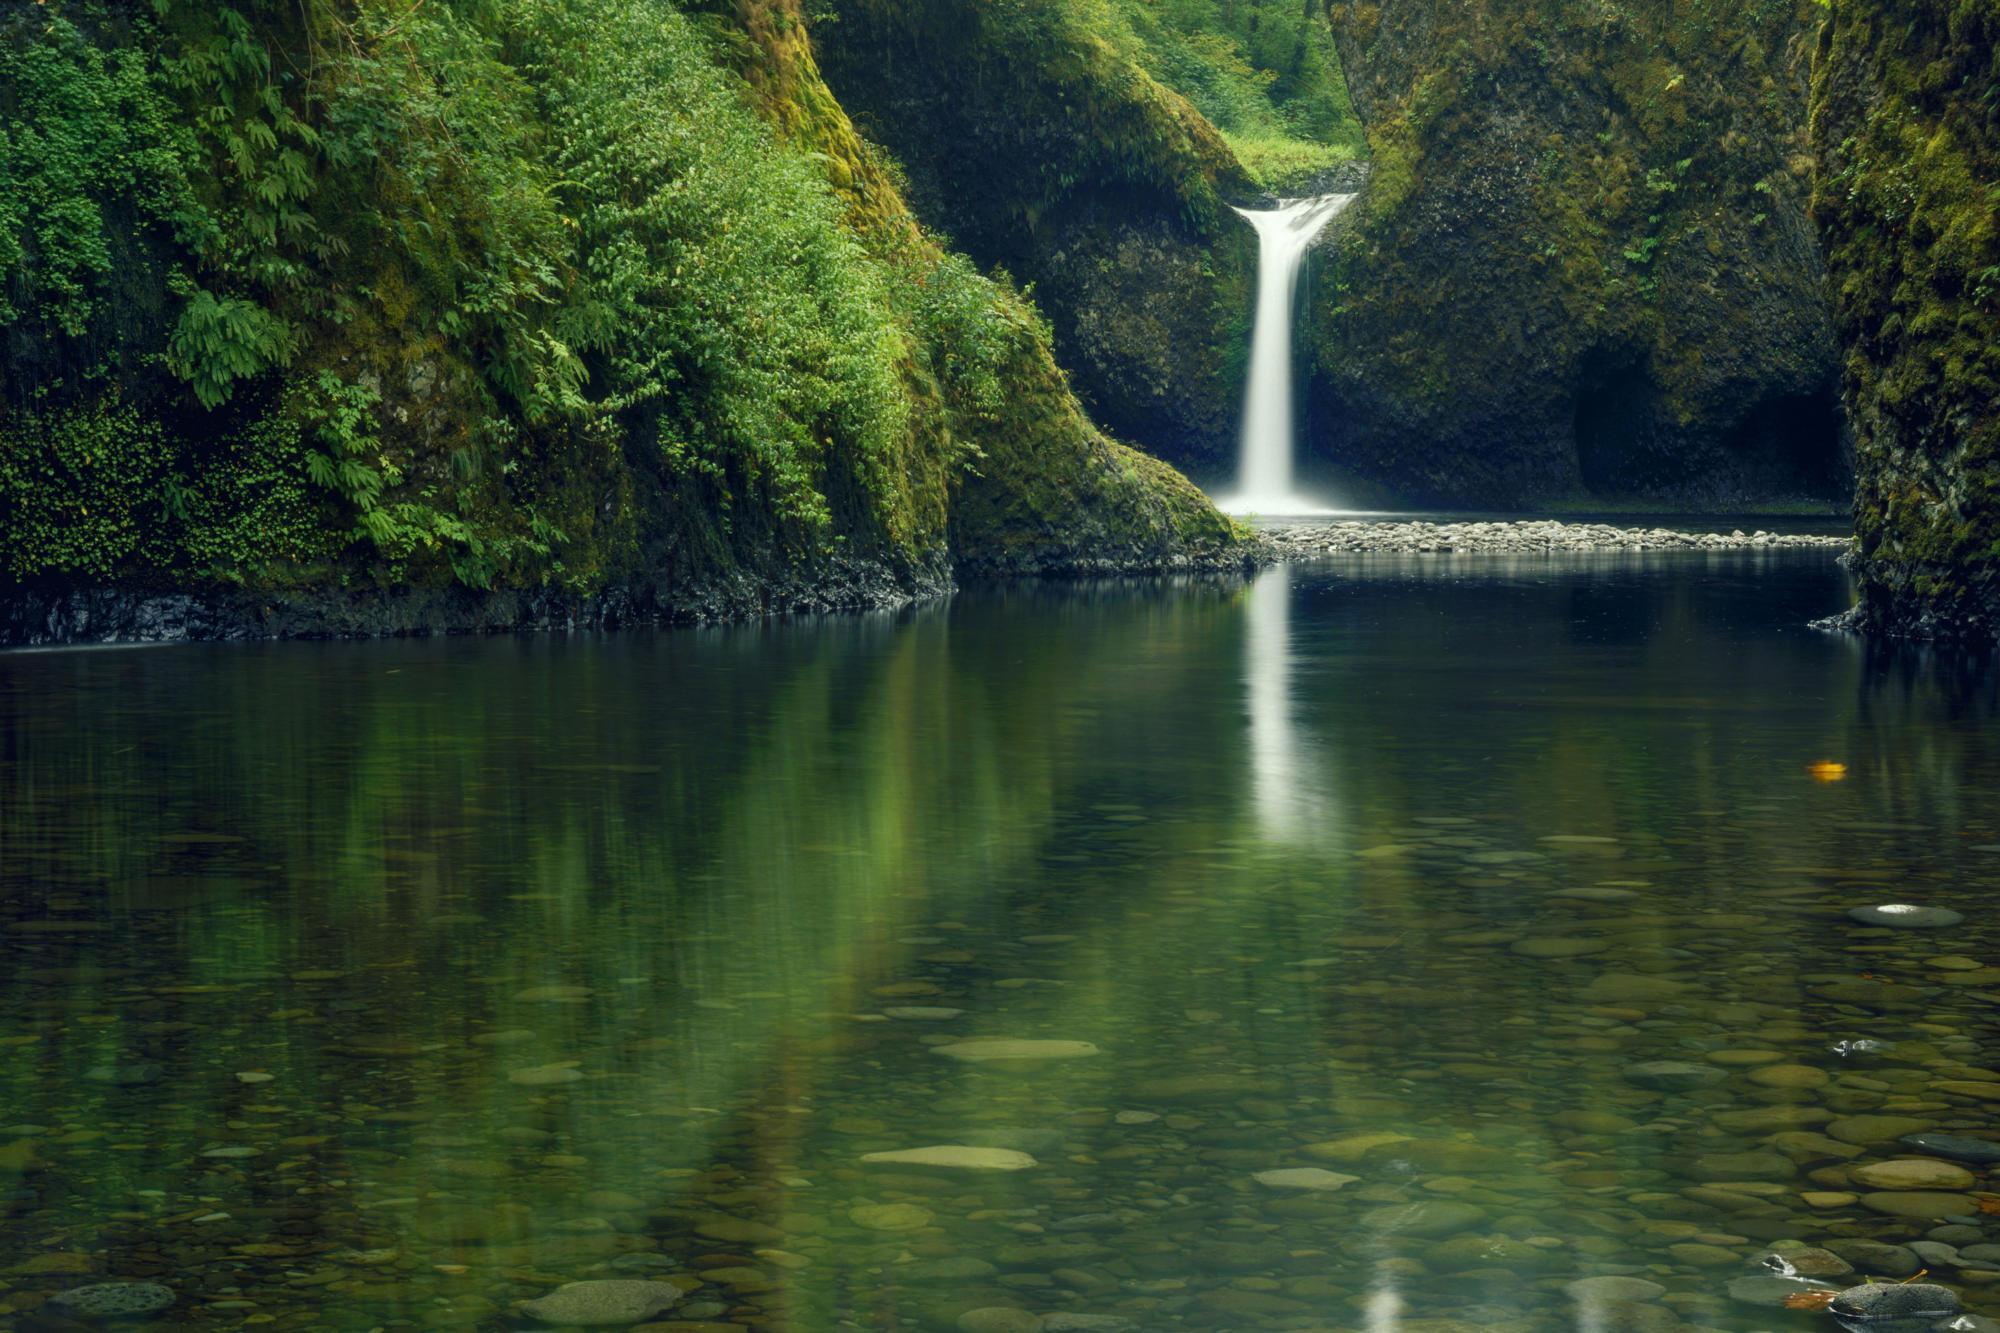 Nature Wallpaper Waterfall Columbia River Oregon: Eagle Creek Mount Hood National